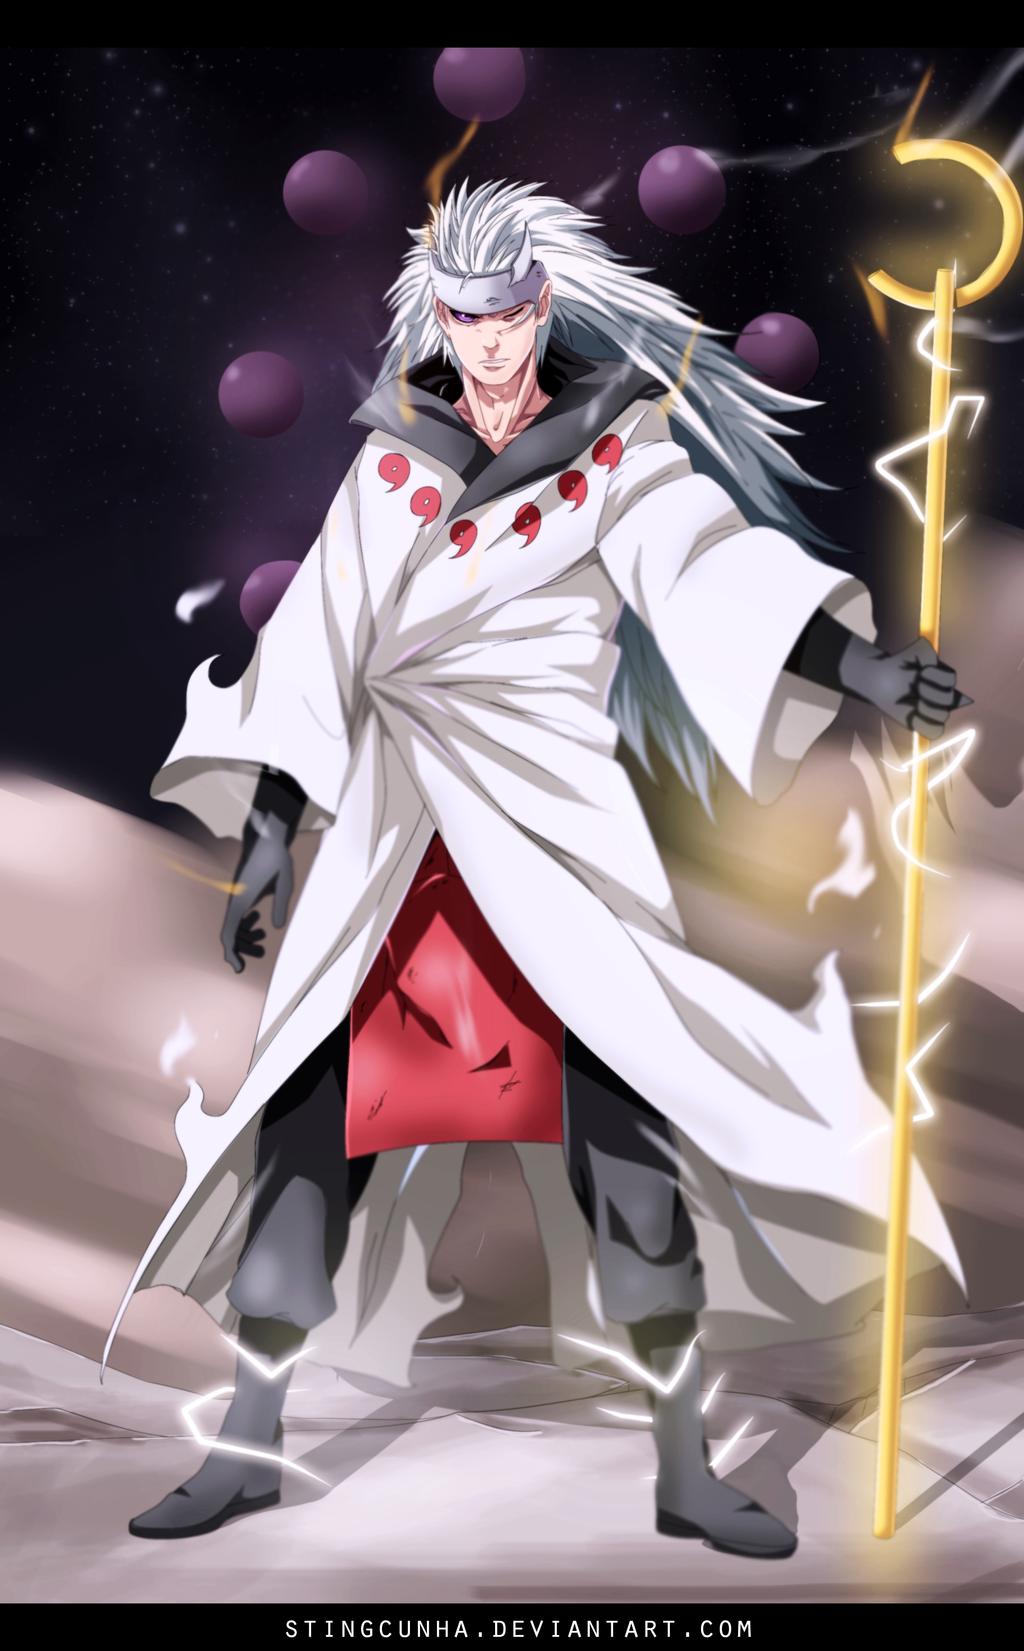 Download 7000+ Wallpaper Naruto Rikudou Mode Android HD Terbaru